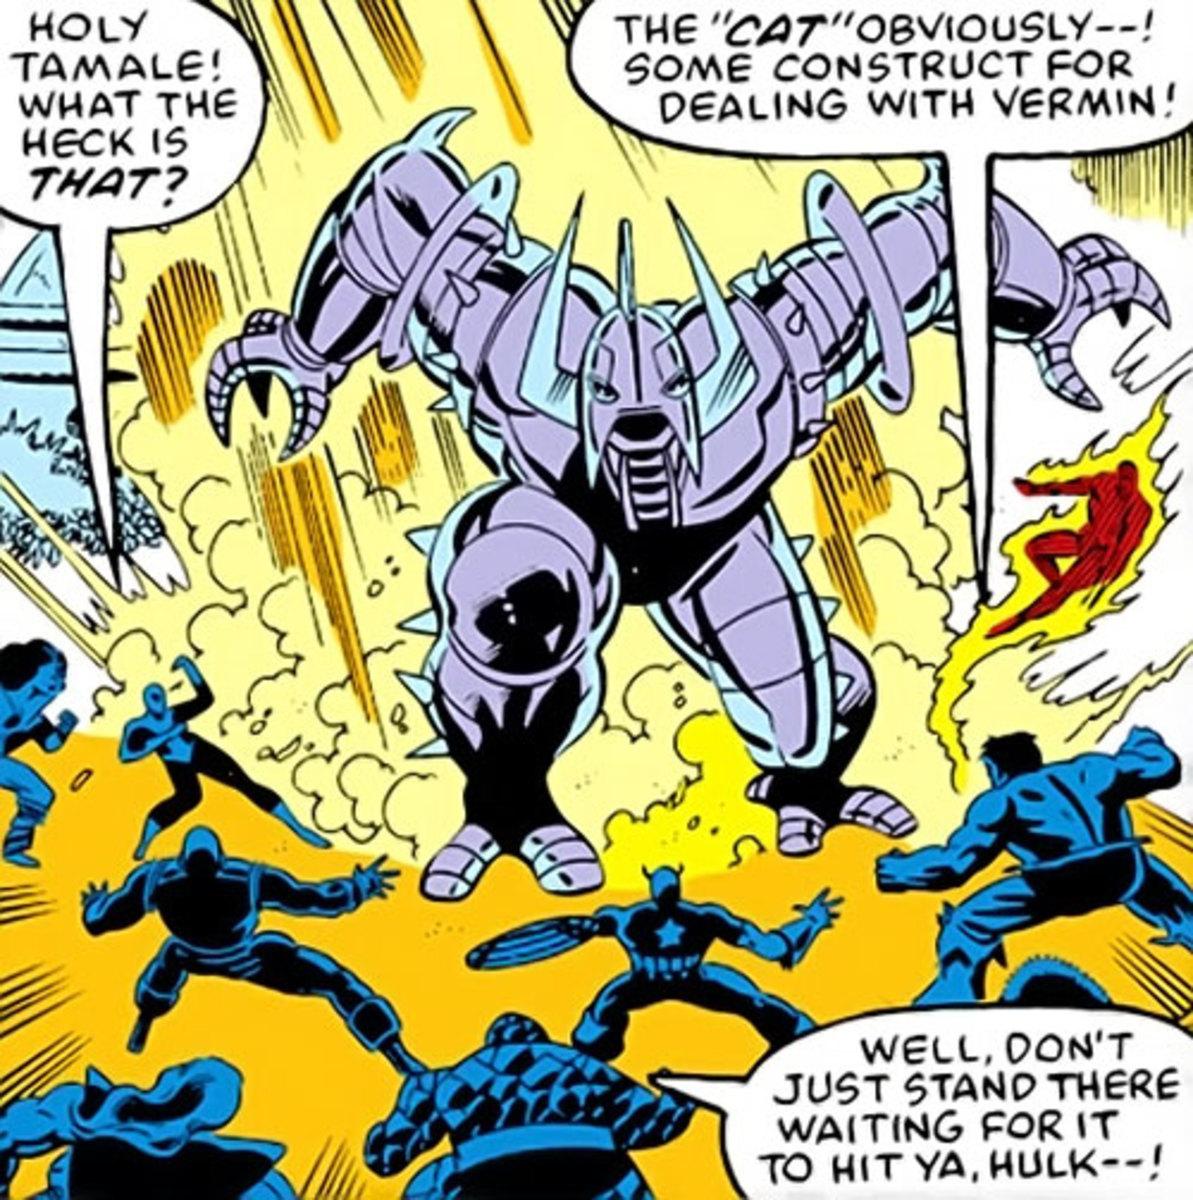 When Galactus views superheroes as mice, he sends the cat.